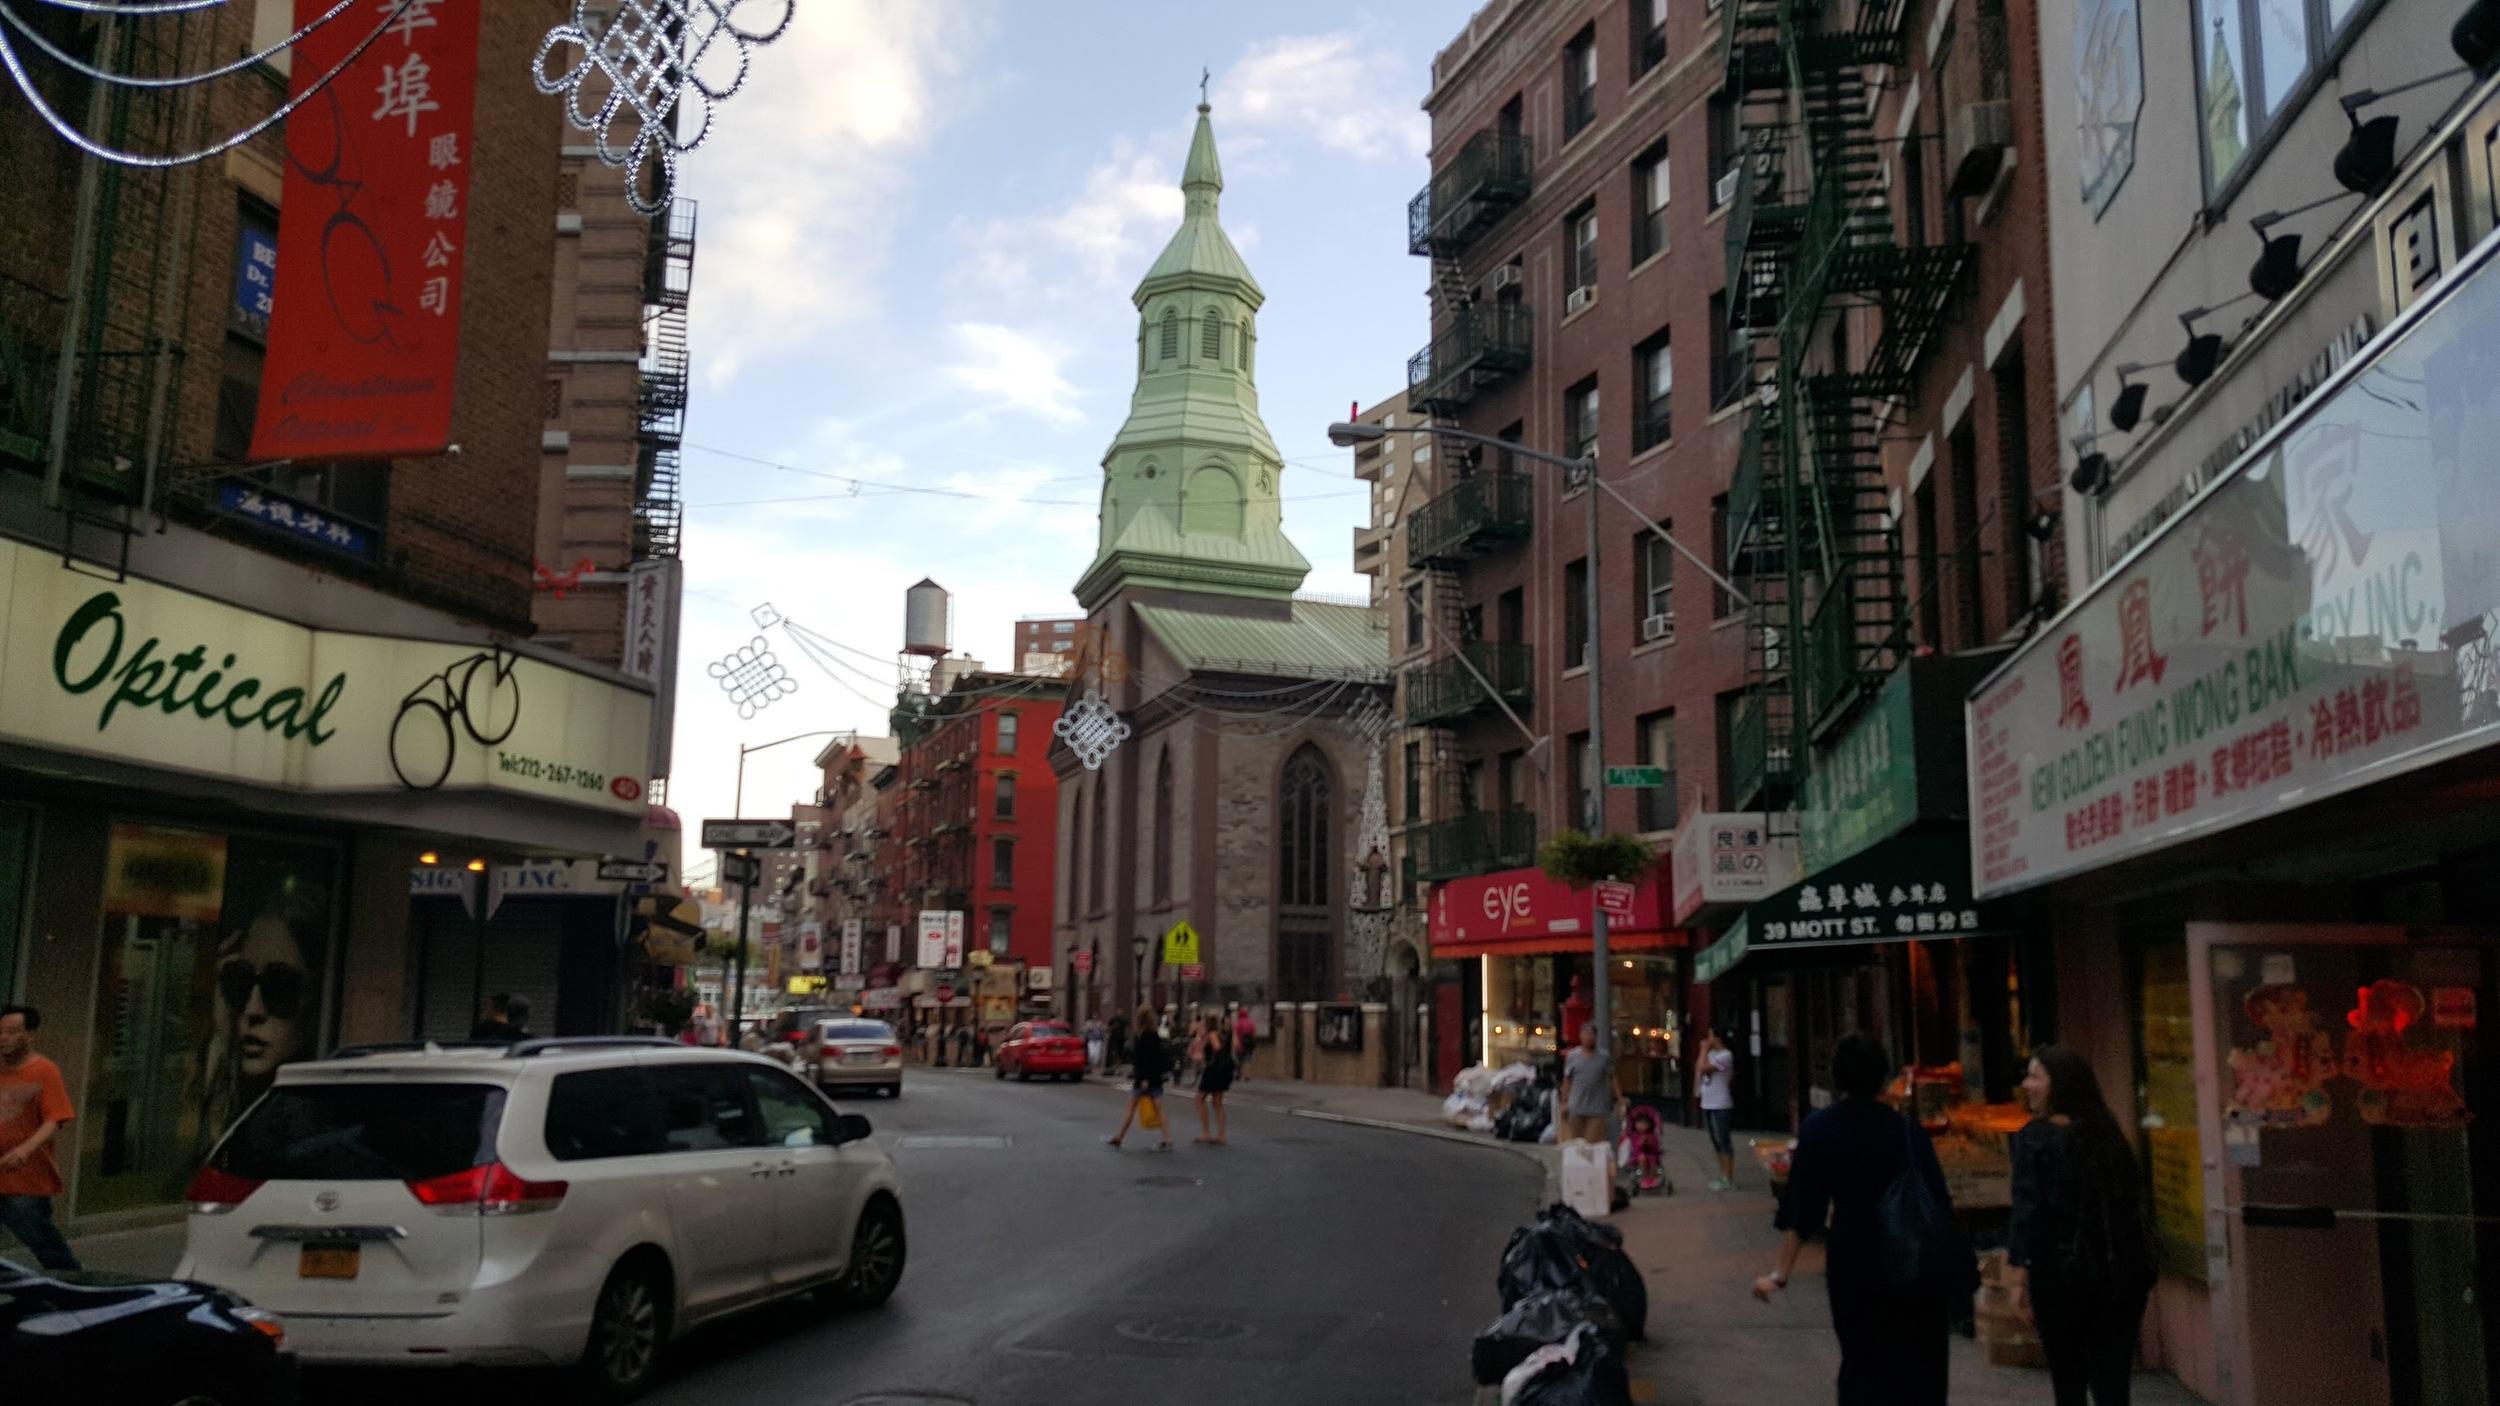 People jaywalking a street in Chinatown in Manhattan.